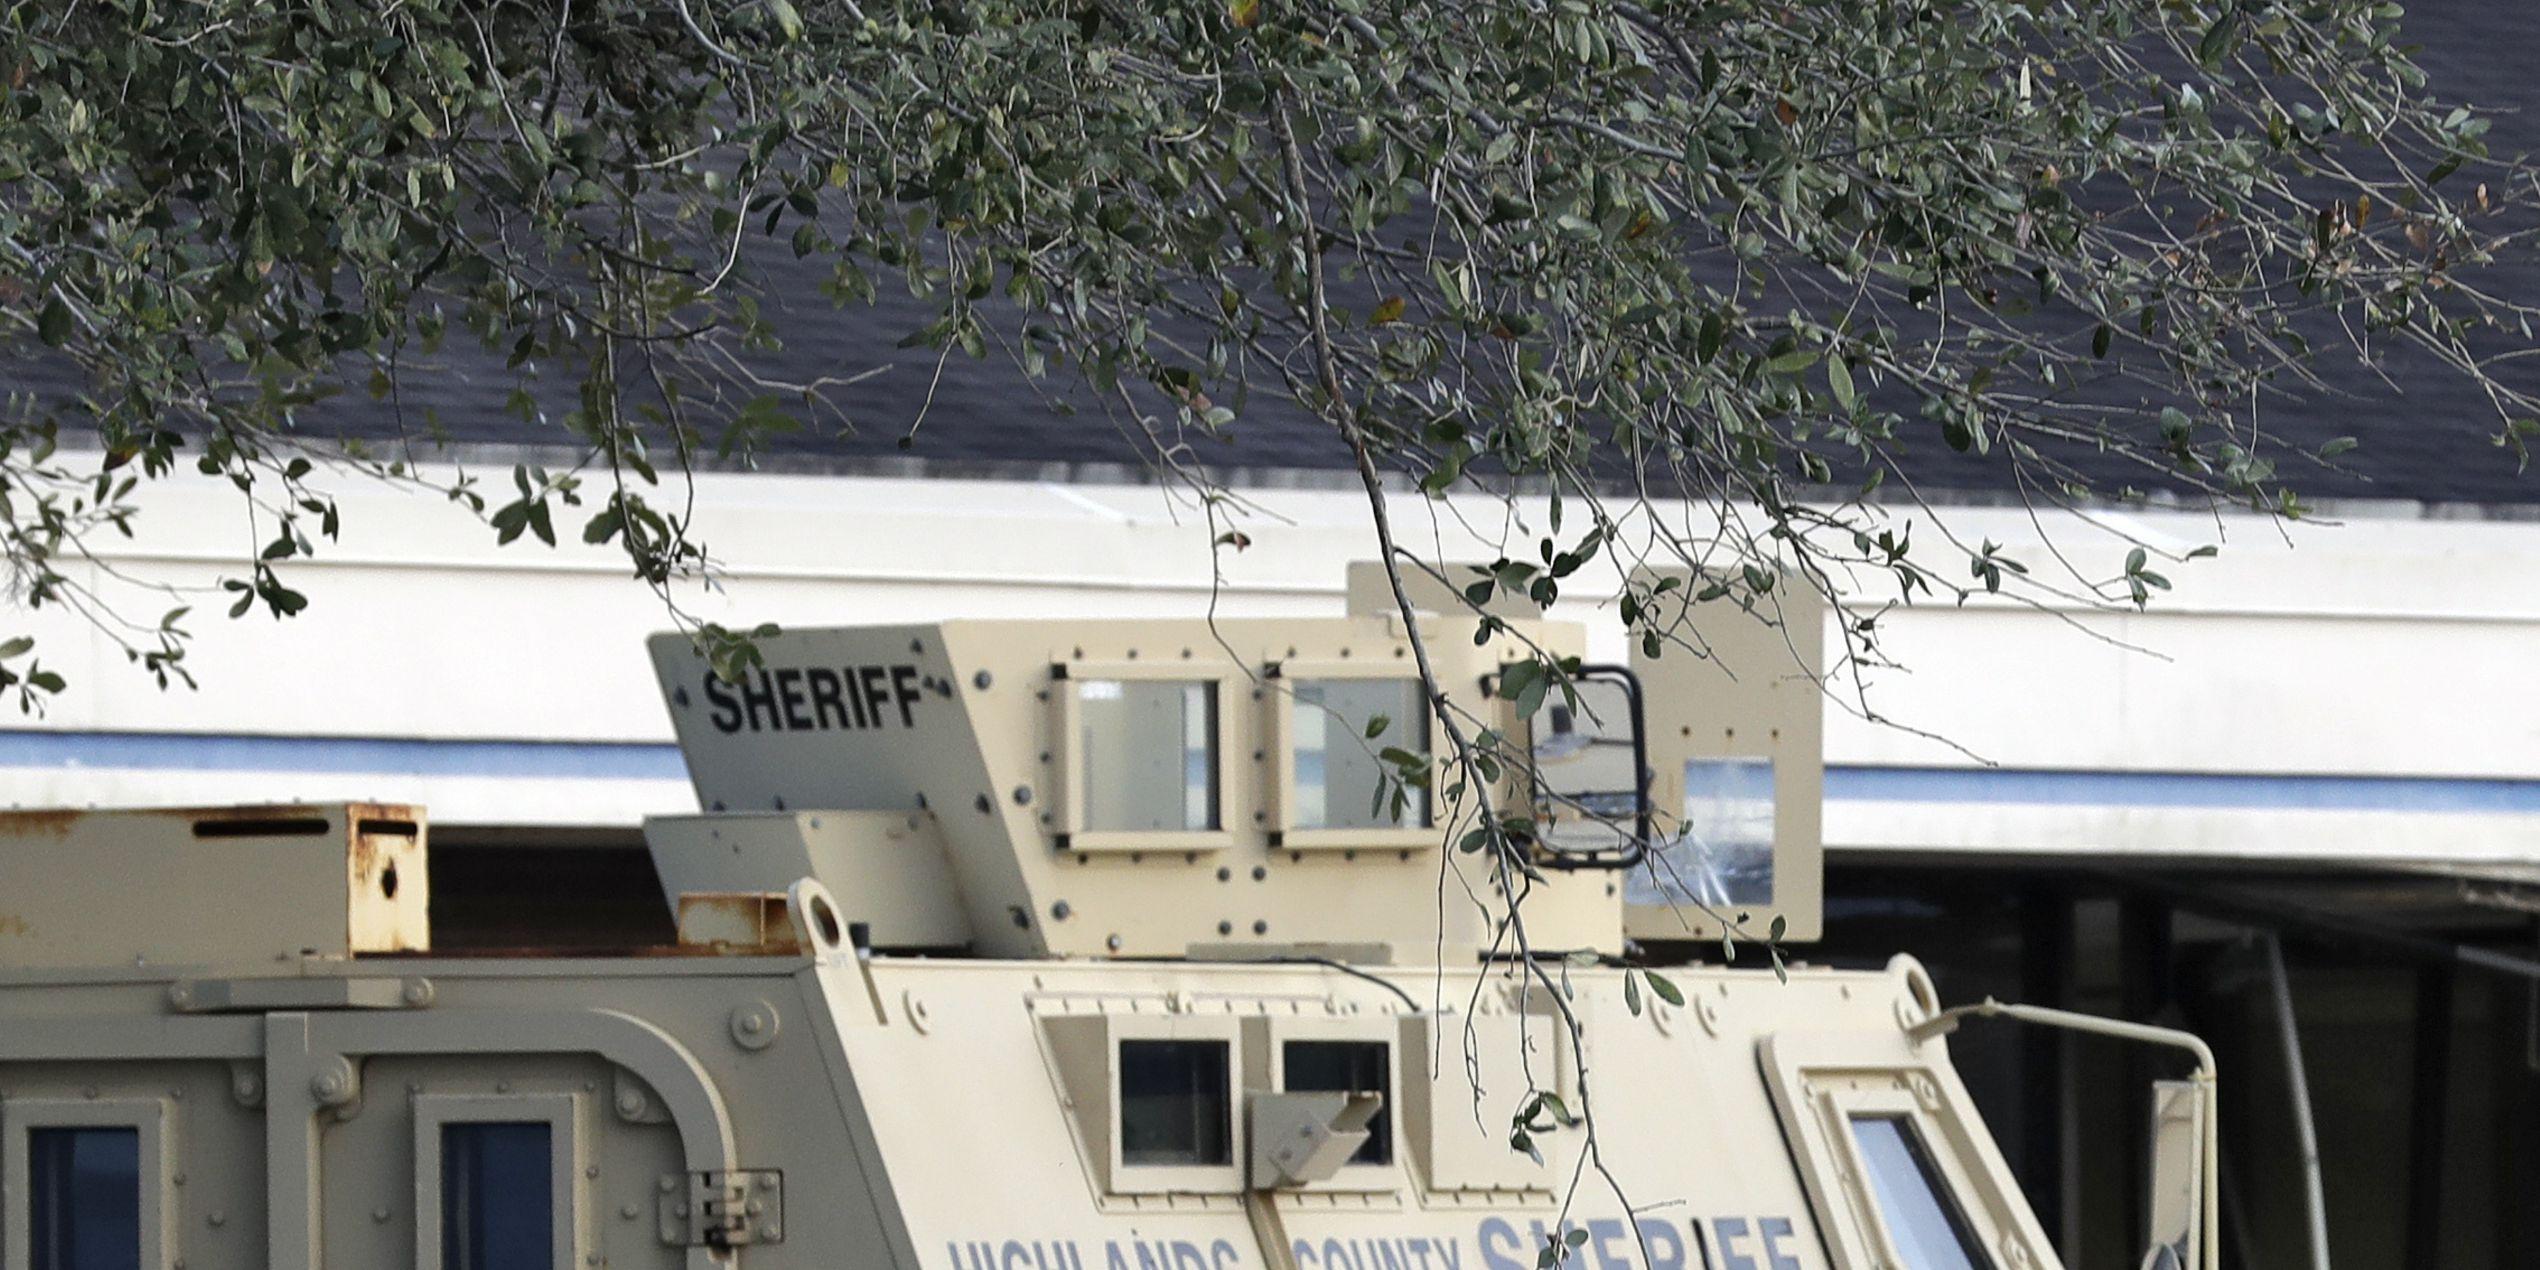 Police describe execution-style killings inside Florida bank, say attack was random act